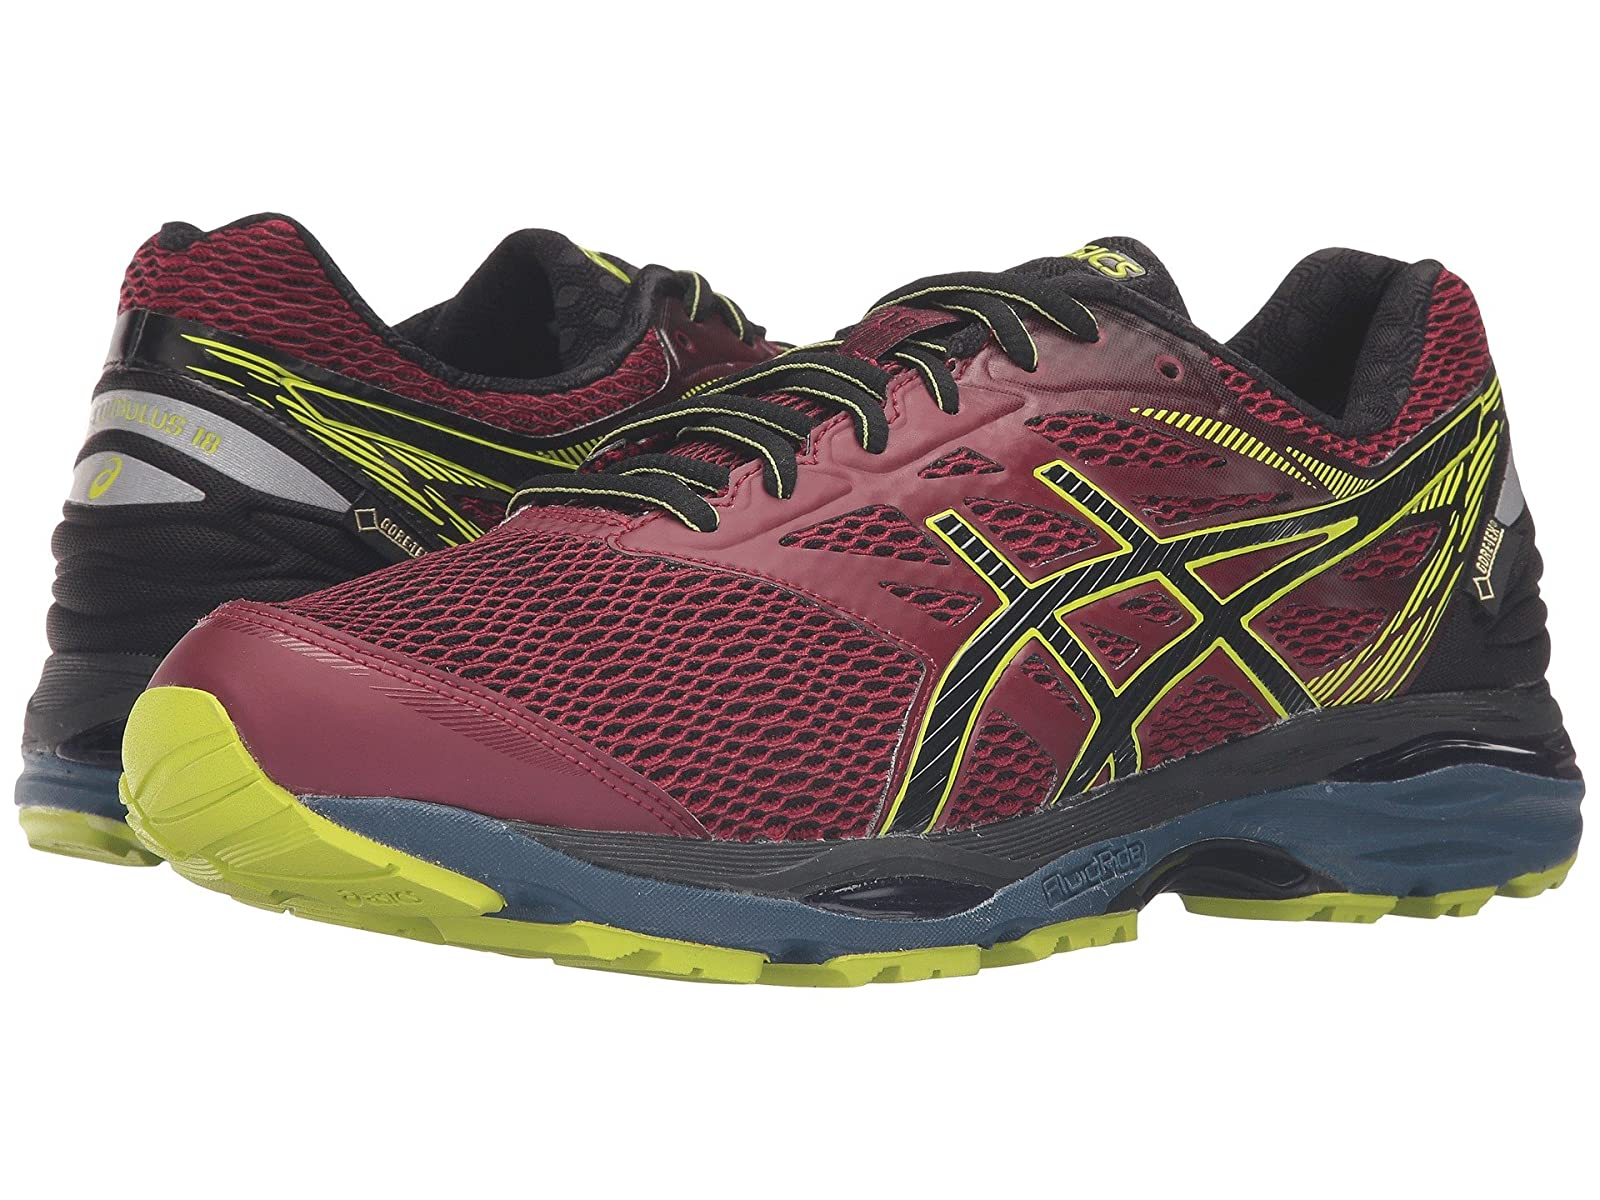 ASICS Gel-Cumulus® 18 GTXCheap and distinctive eye-catching shoes